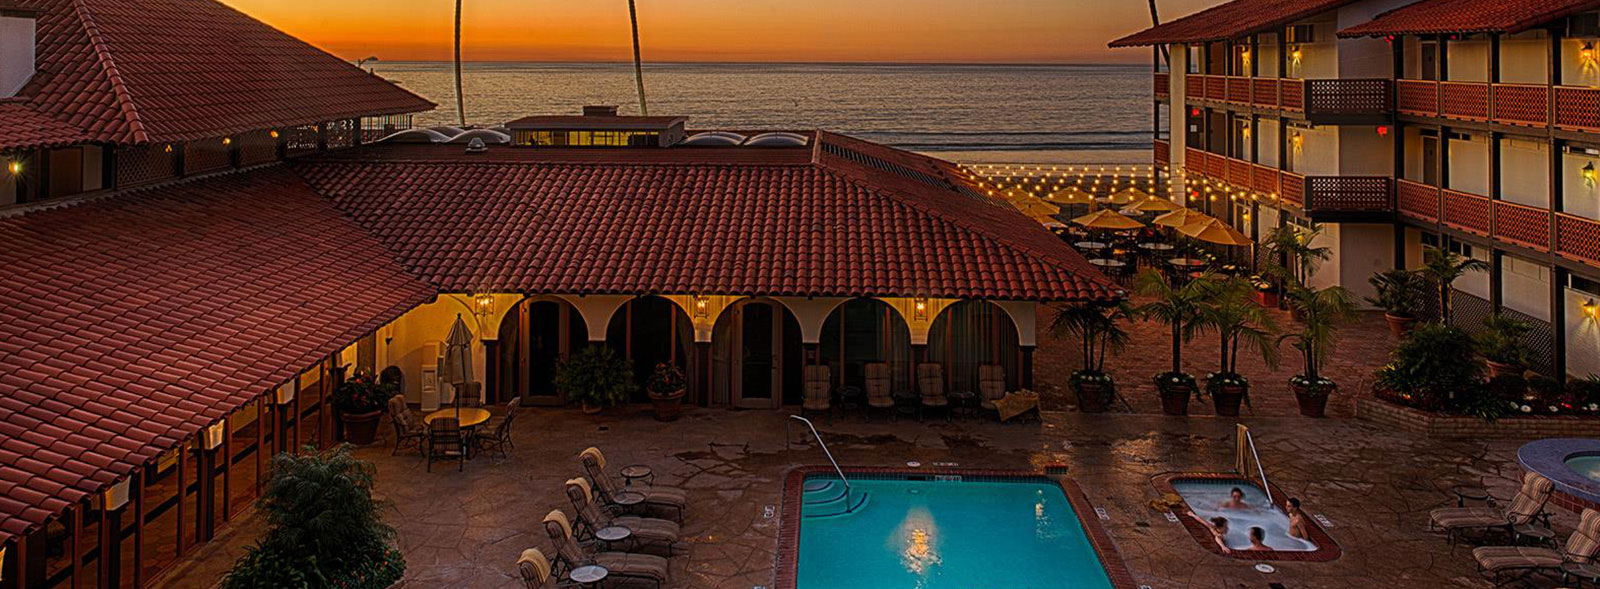 La Jolla Shores Hotel California Sitemap